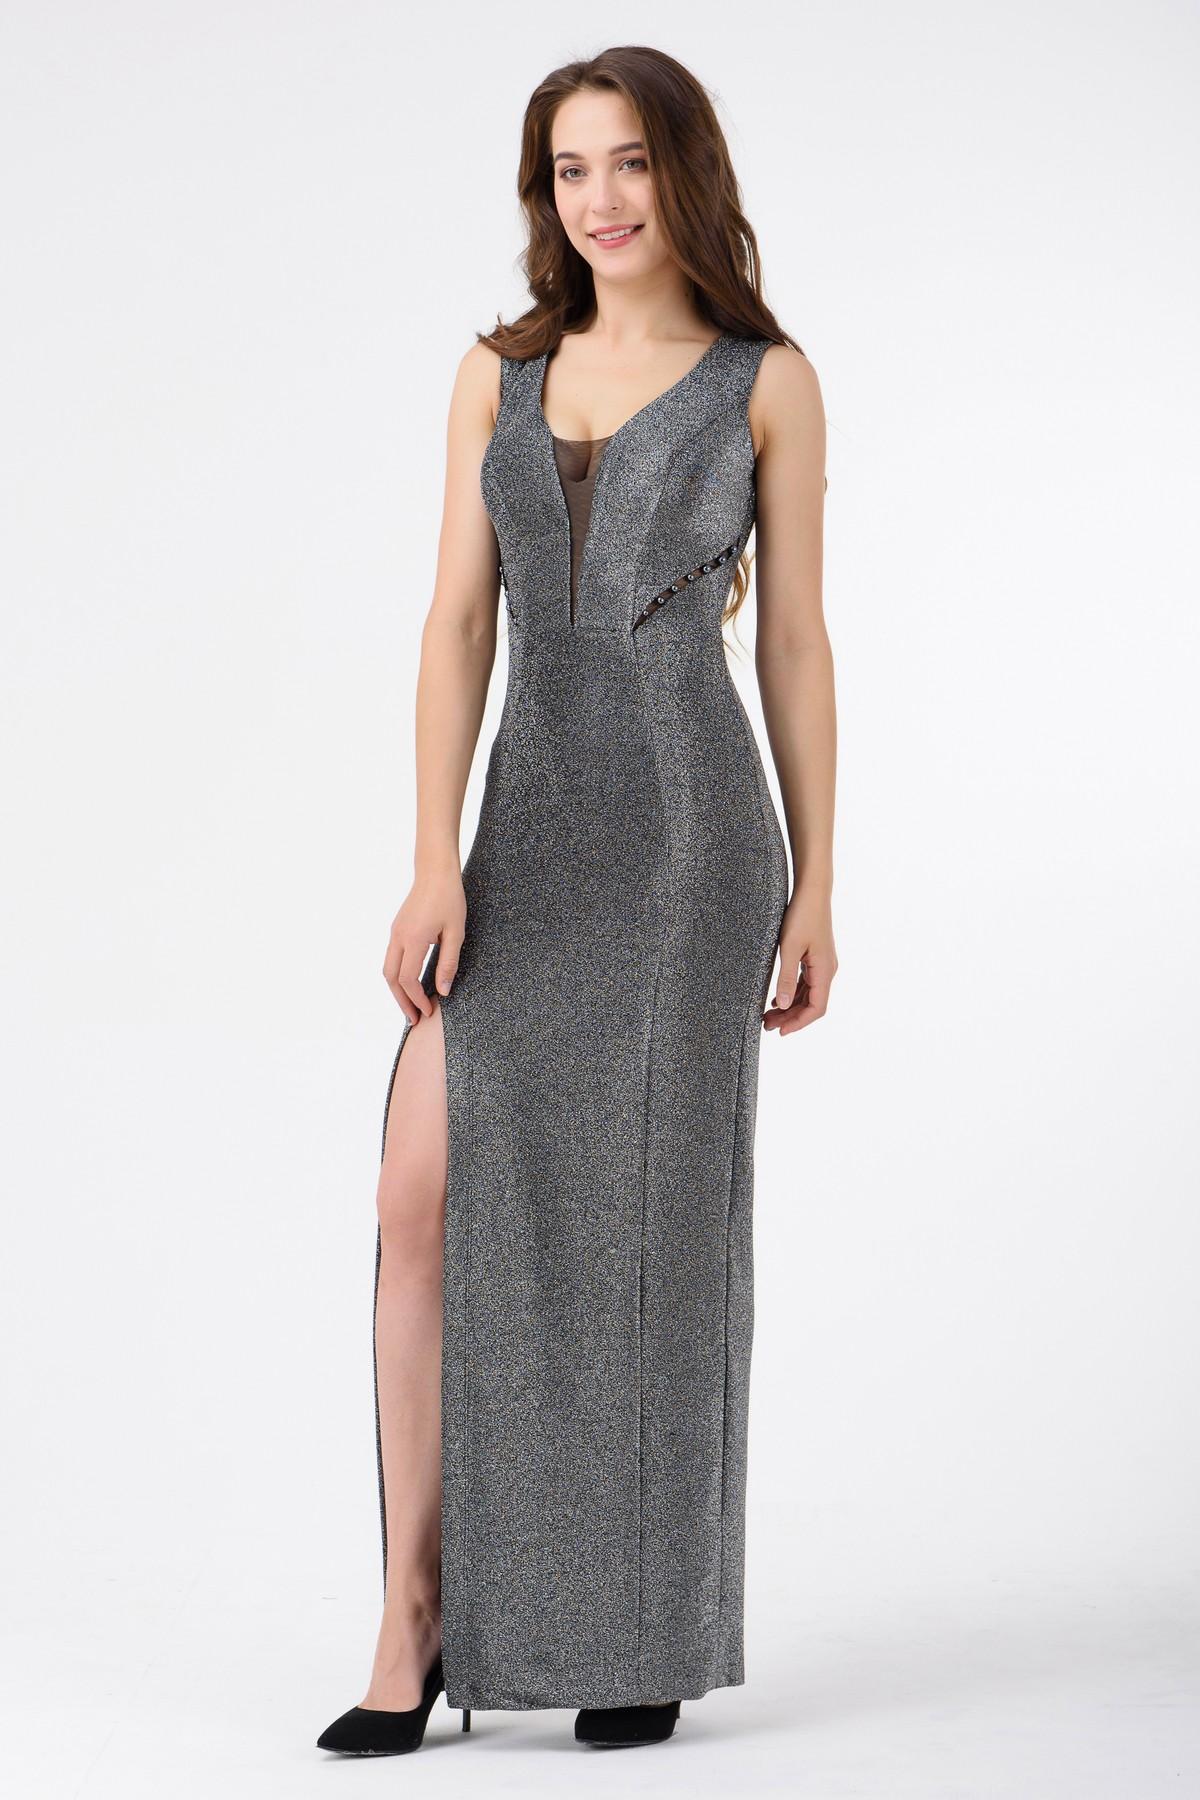 f37d47e0adc6d15 Вечернее платье в пол с глубоким декольте | Купить вечернее платье ...